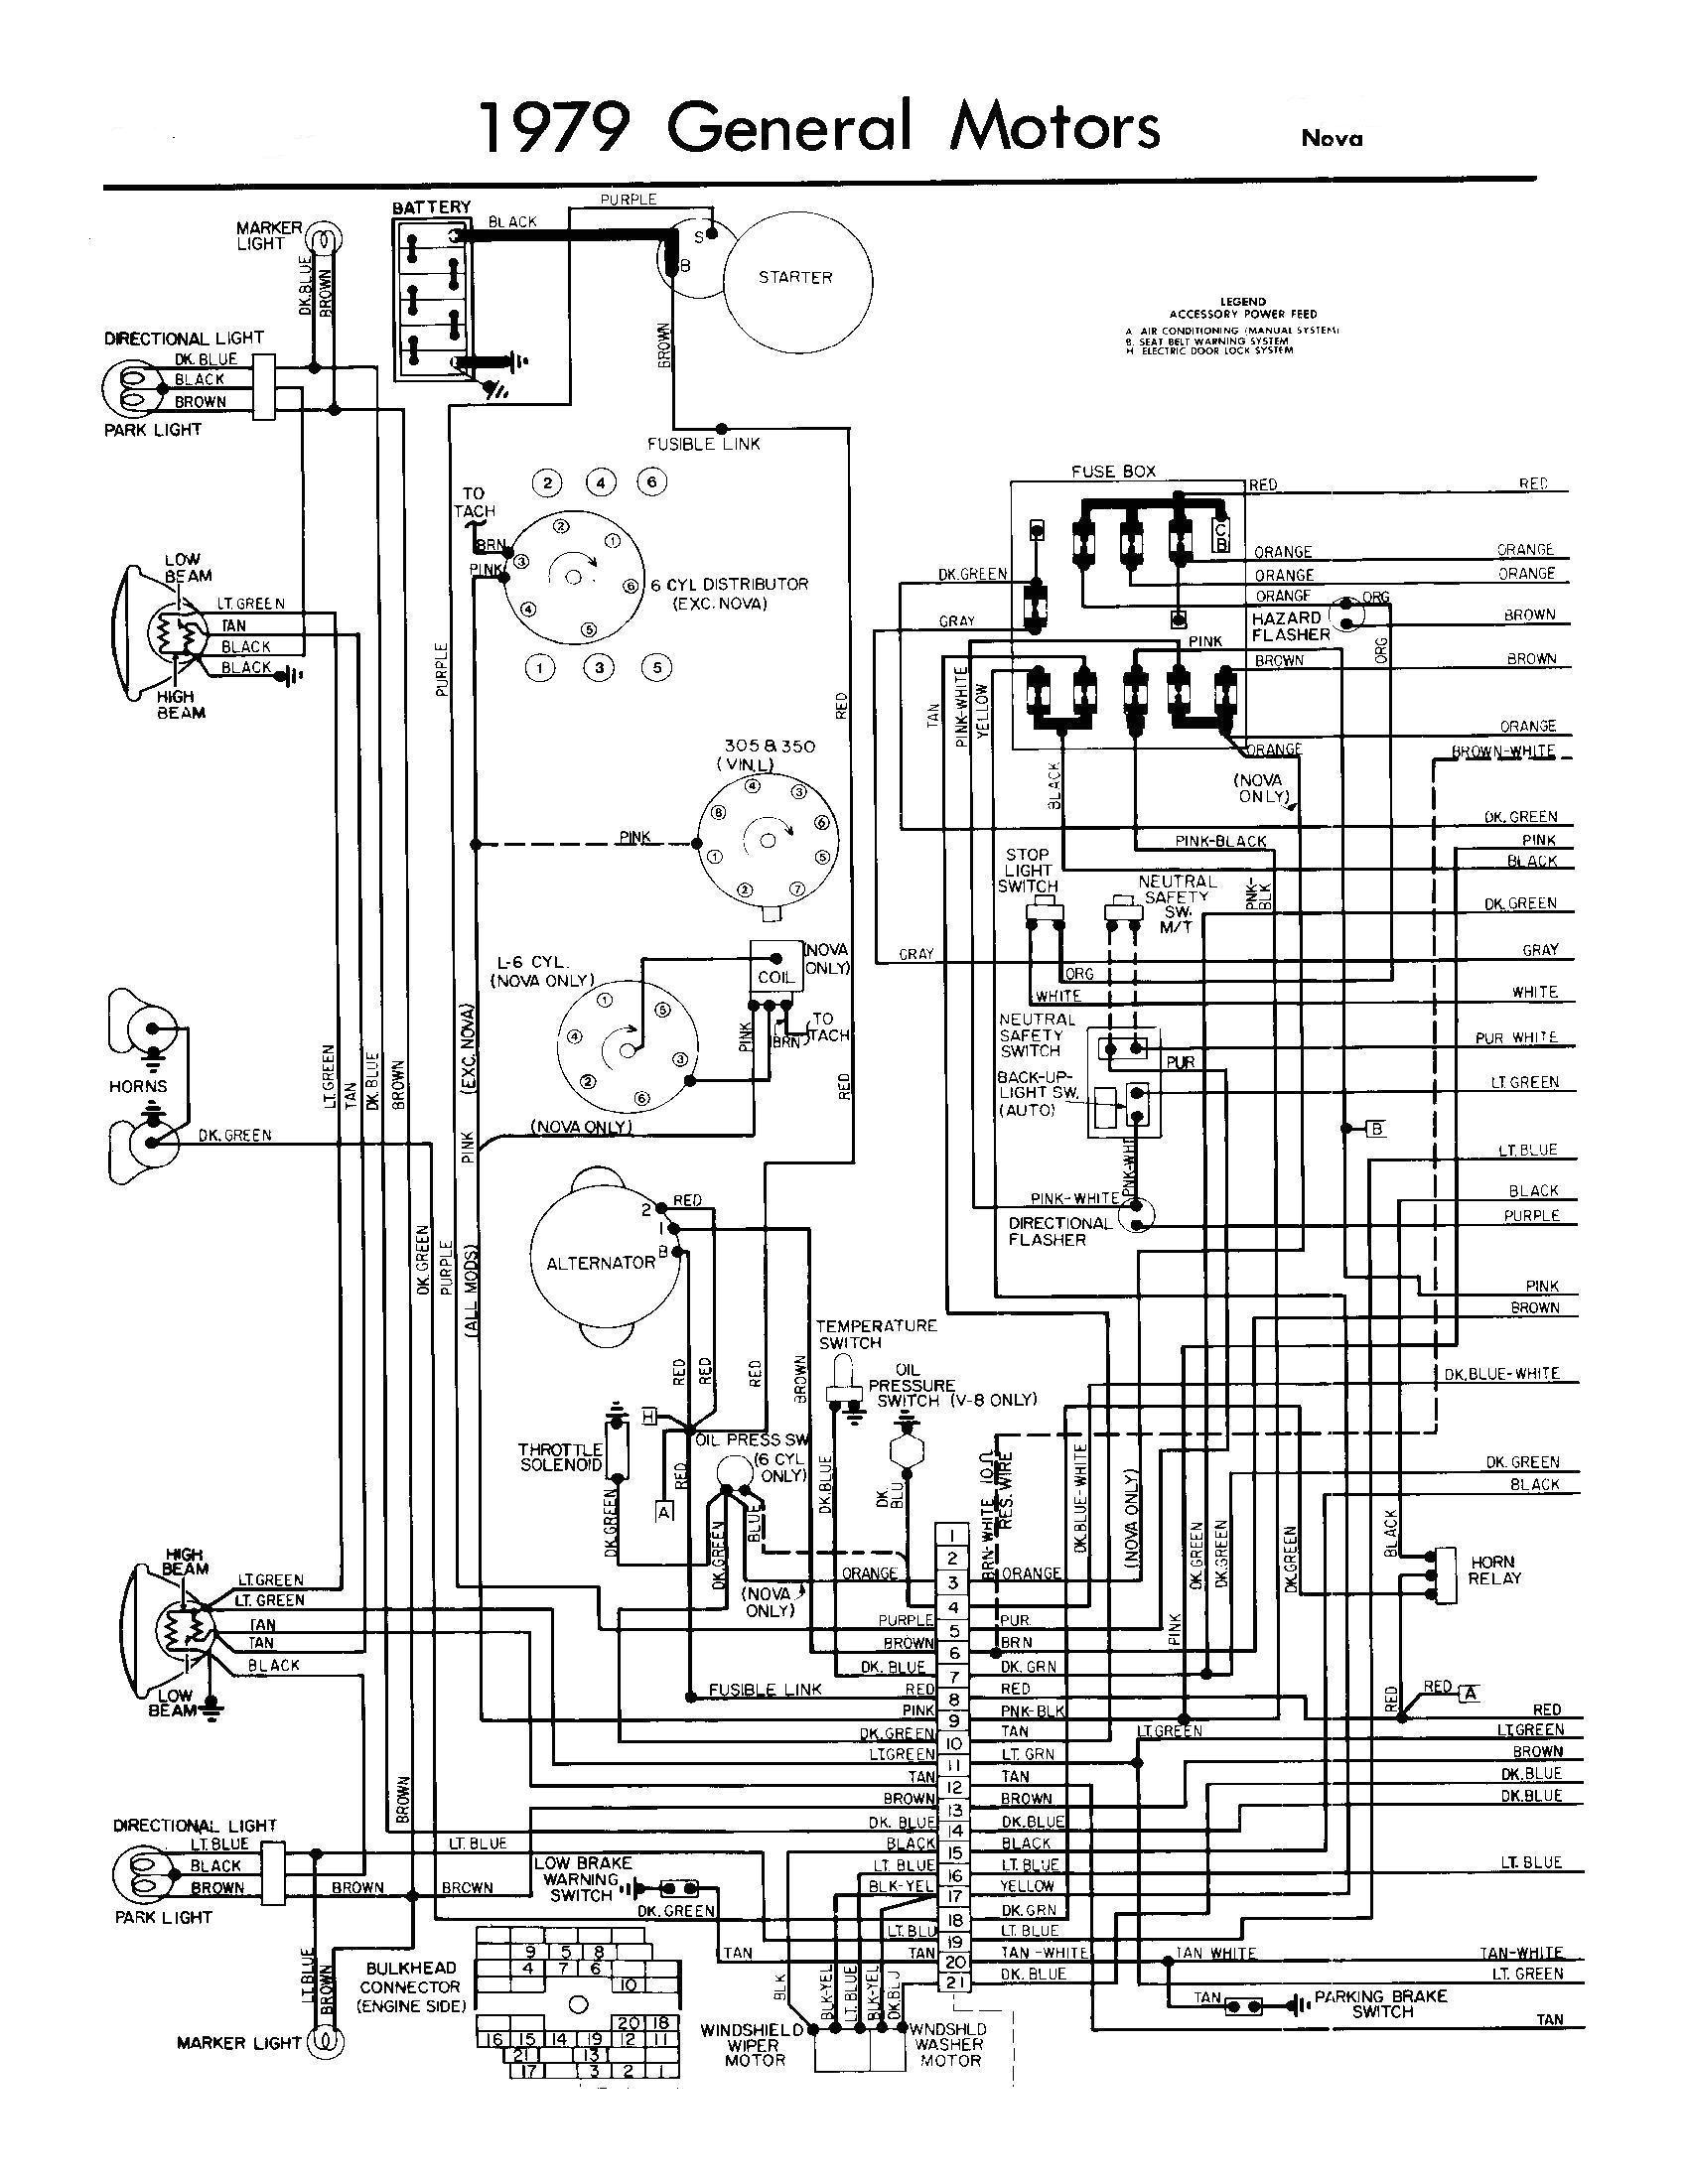 wiring diagrams for chevy trucks all generation wiring schematics chevy nova forum of wiring diagrams for chevy trucks jpg